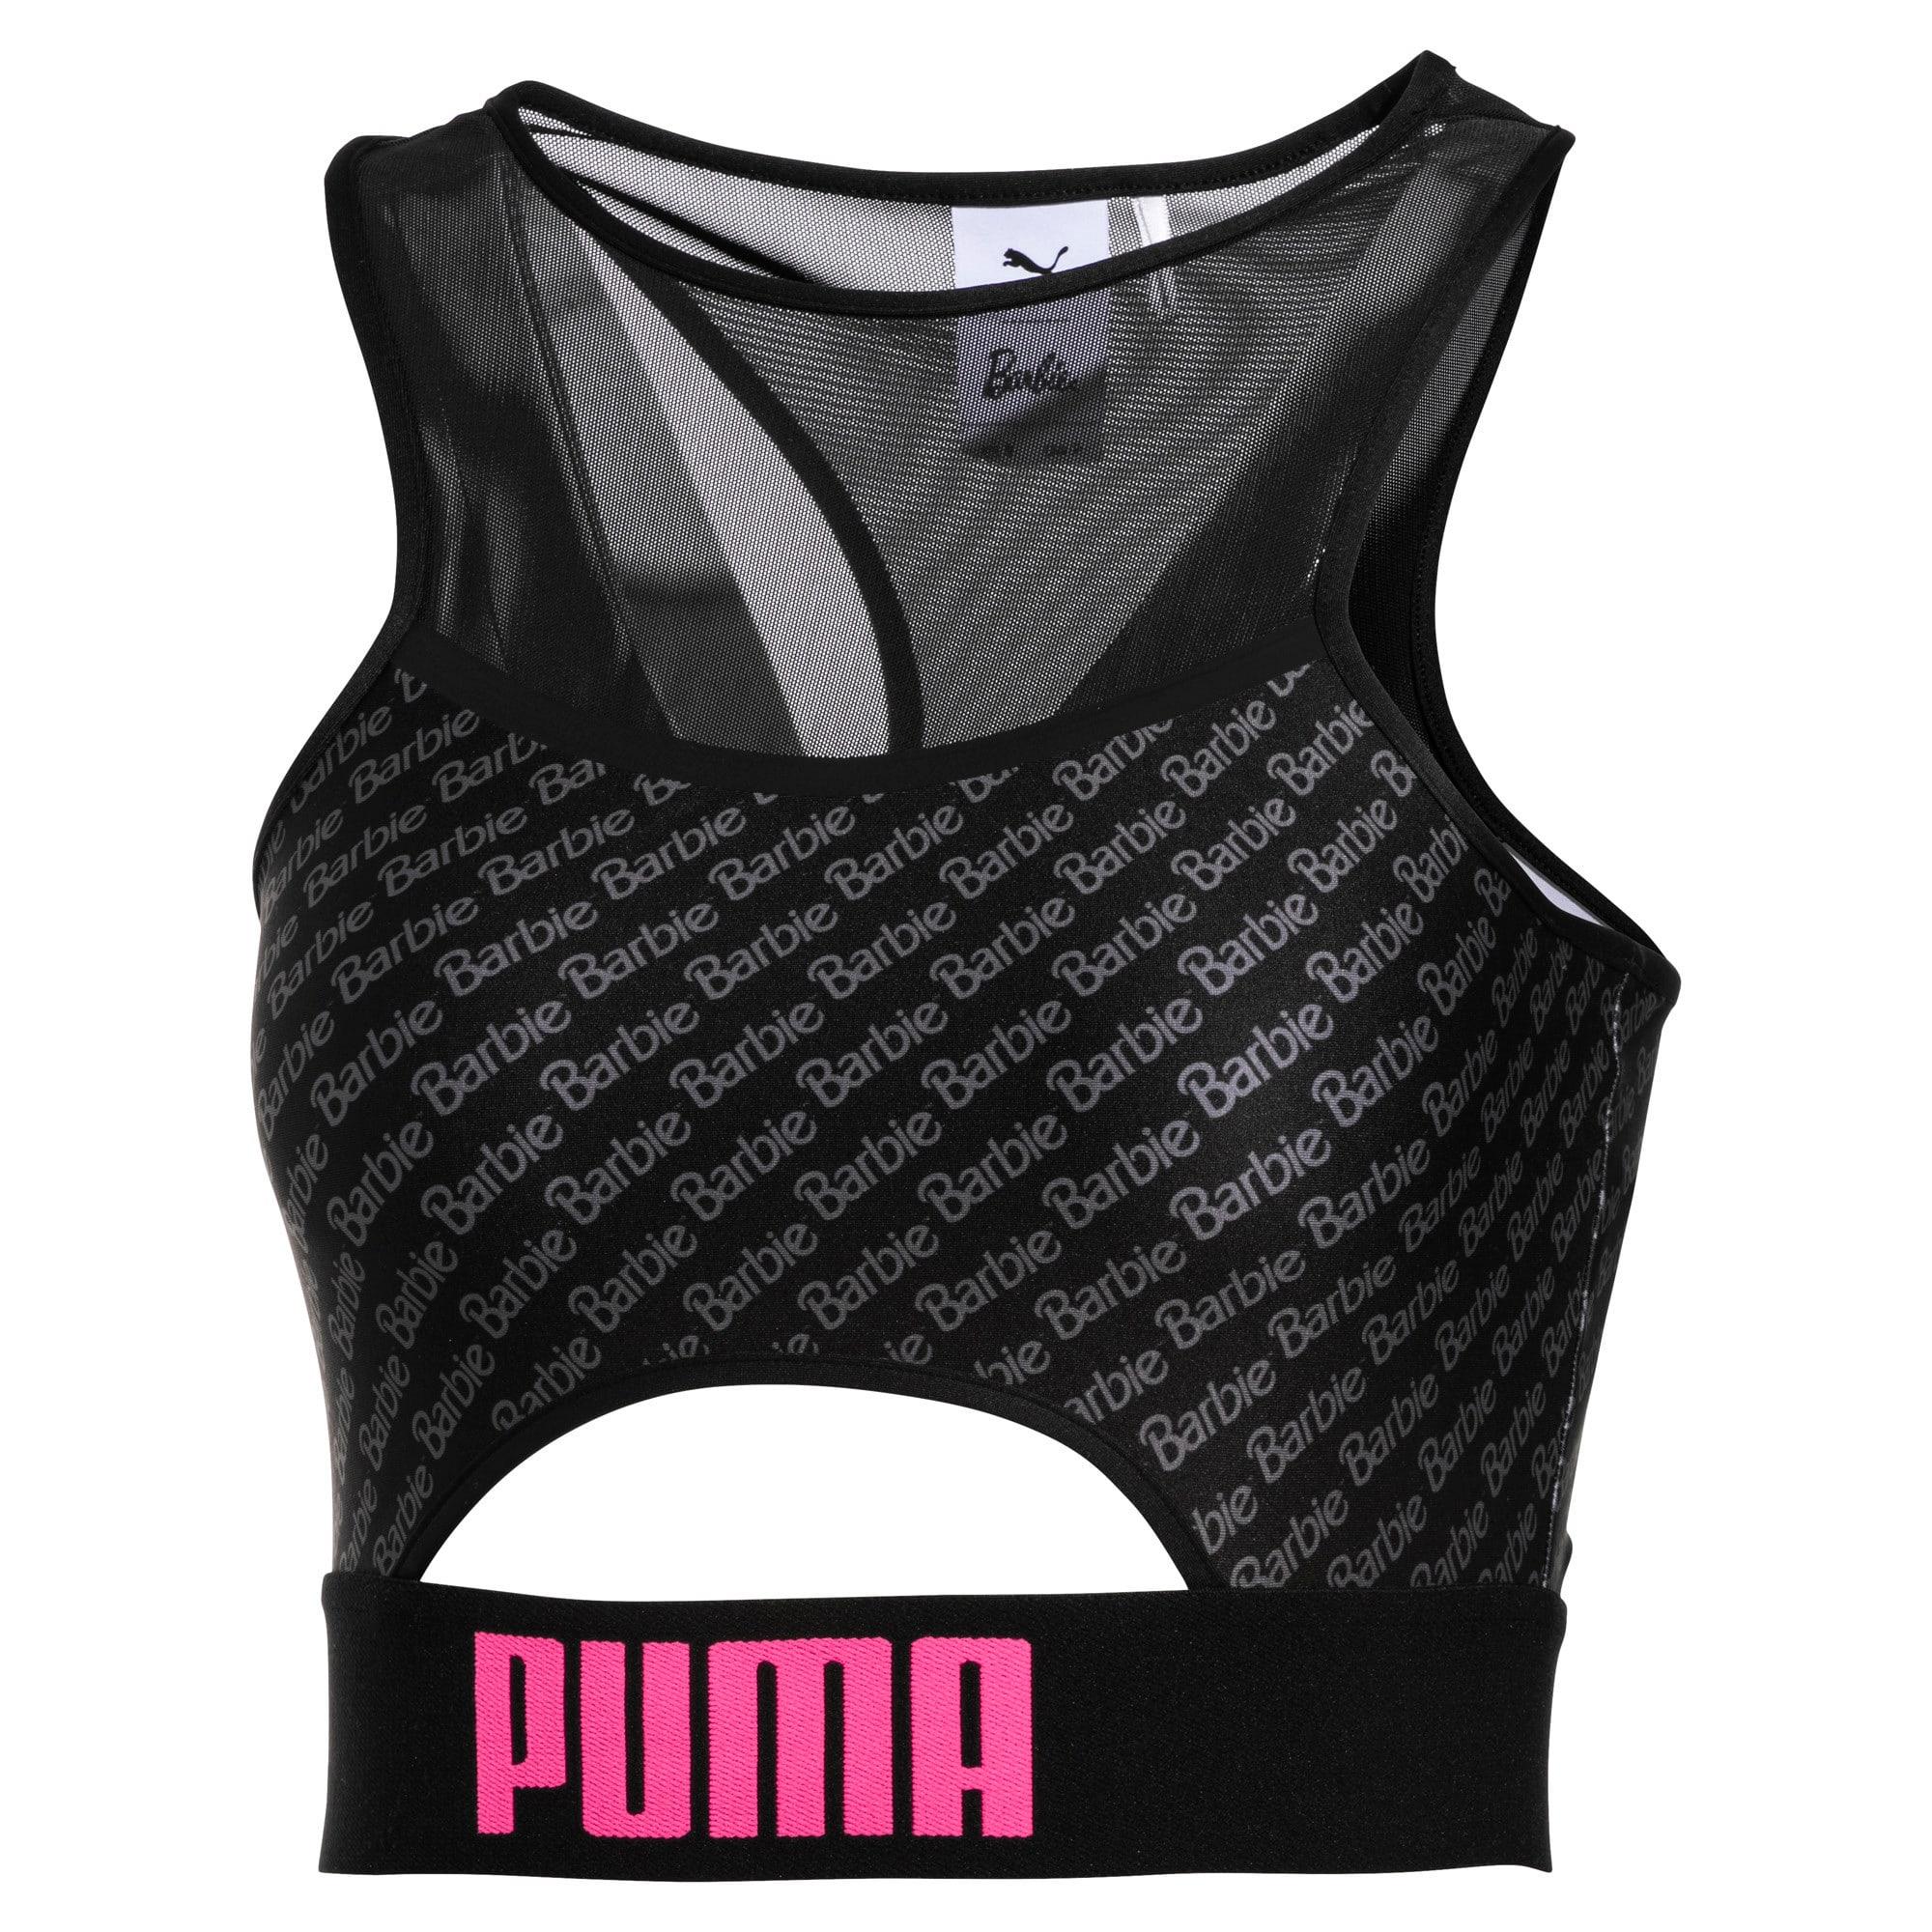 Thumbnail 1 of PUMA x BARBIE Women's Crop Top, Puma Black, medium